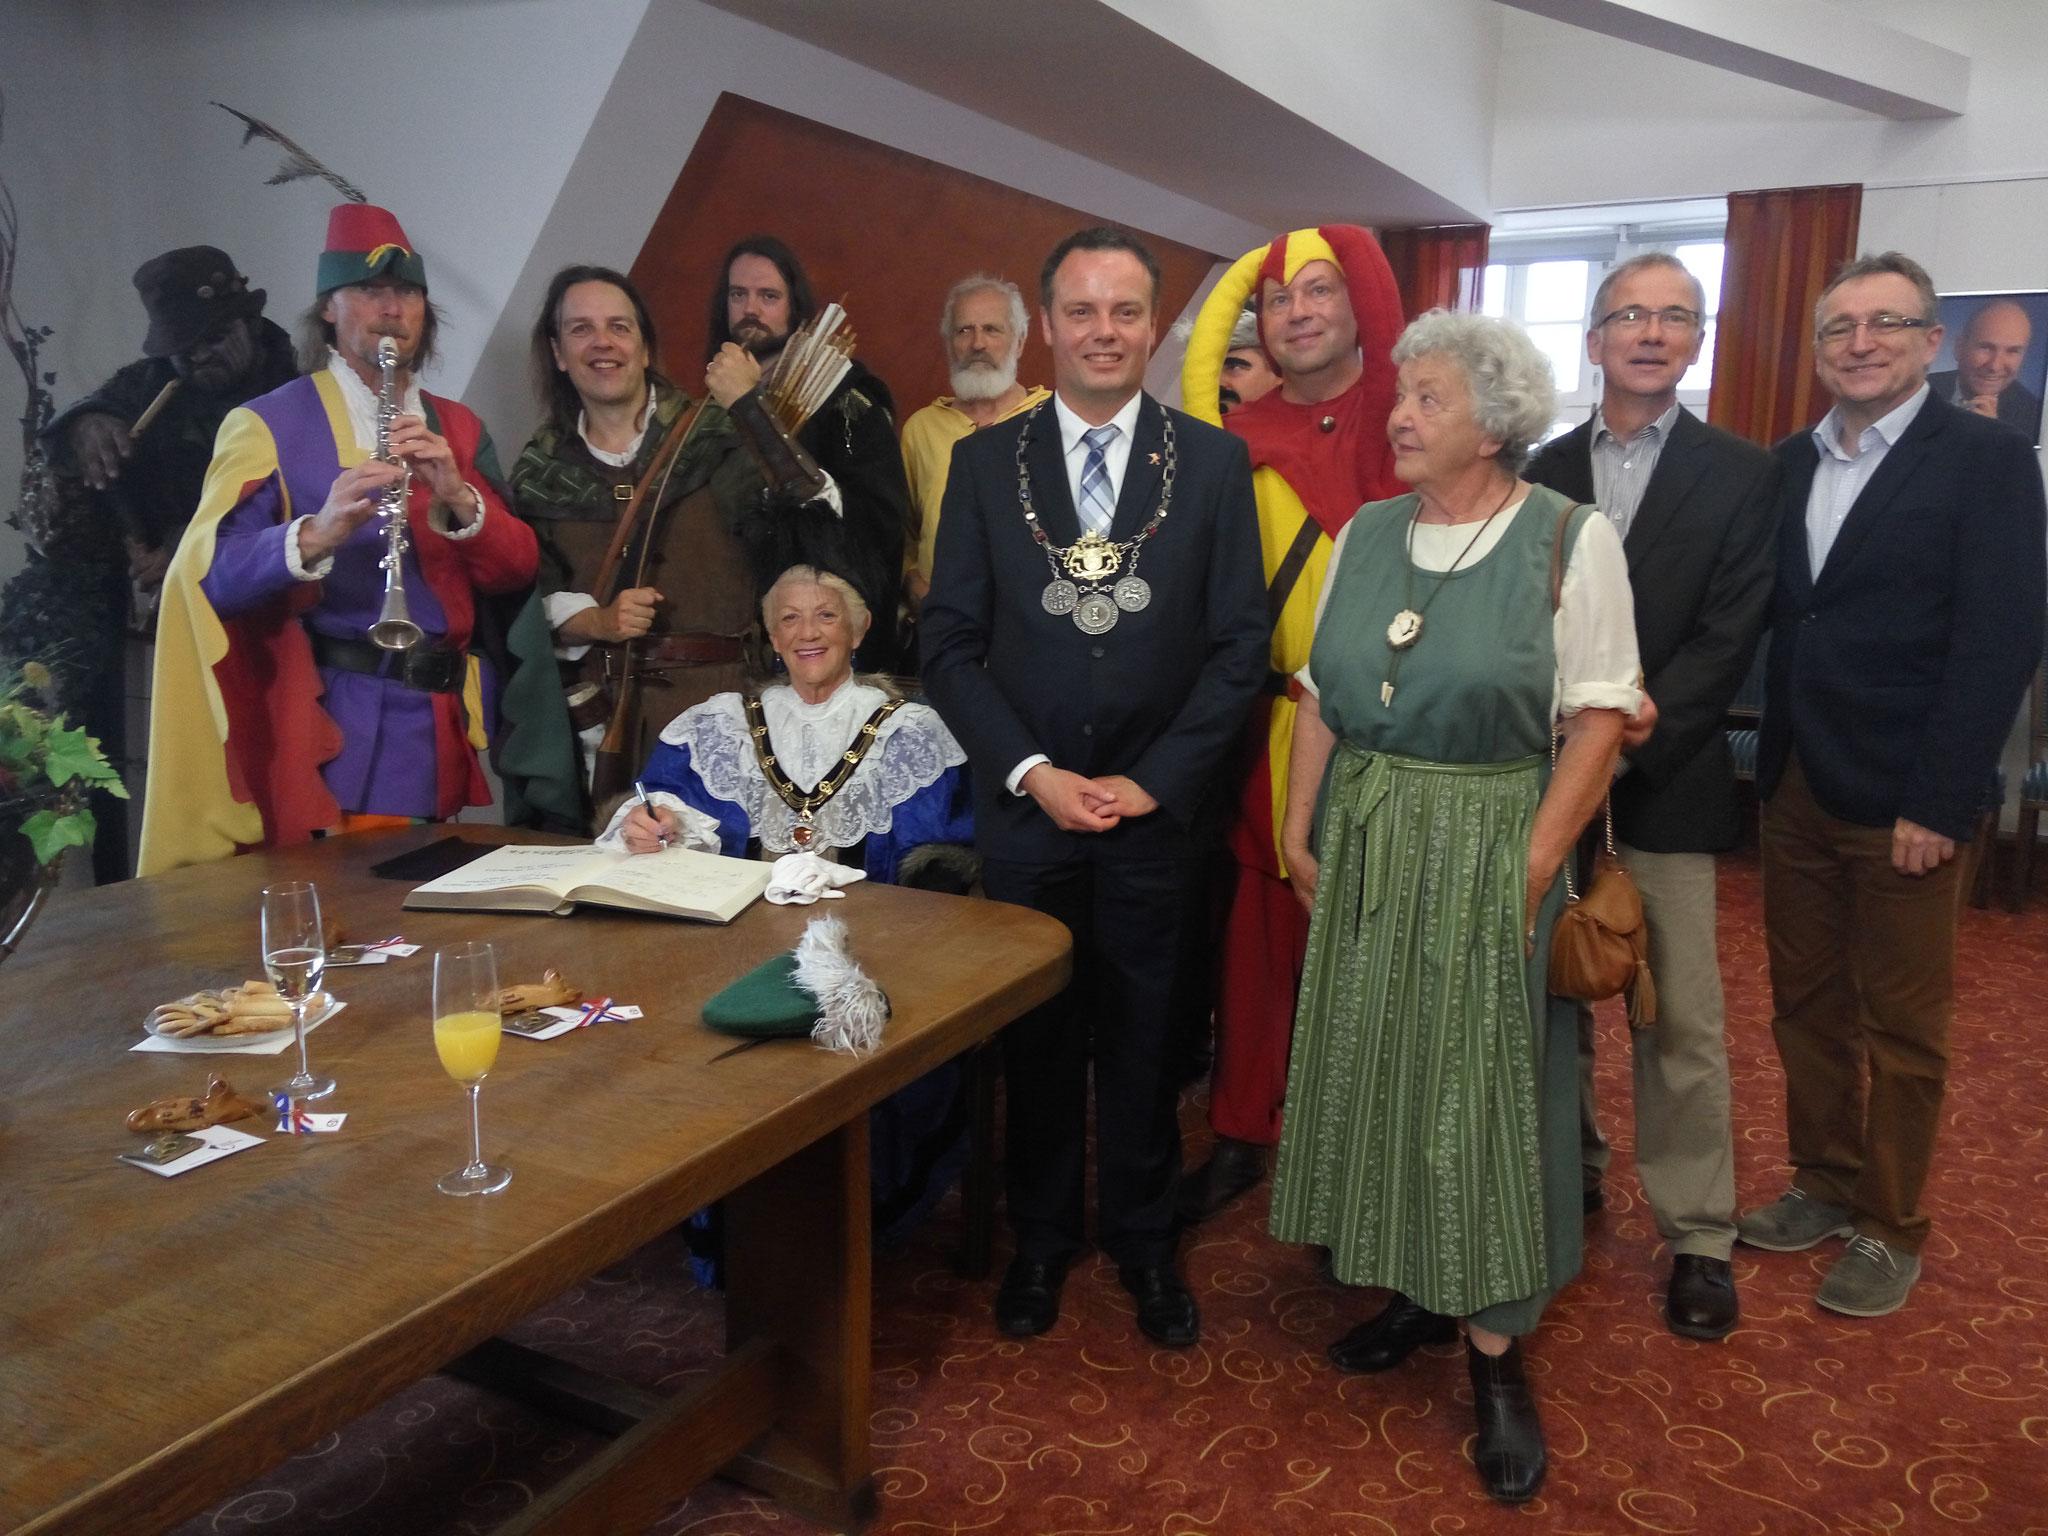 Märchenhaftes Gruppenbild mit Oberbürgermeister